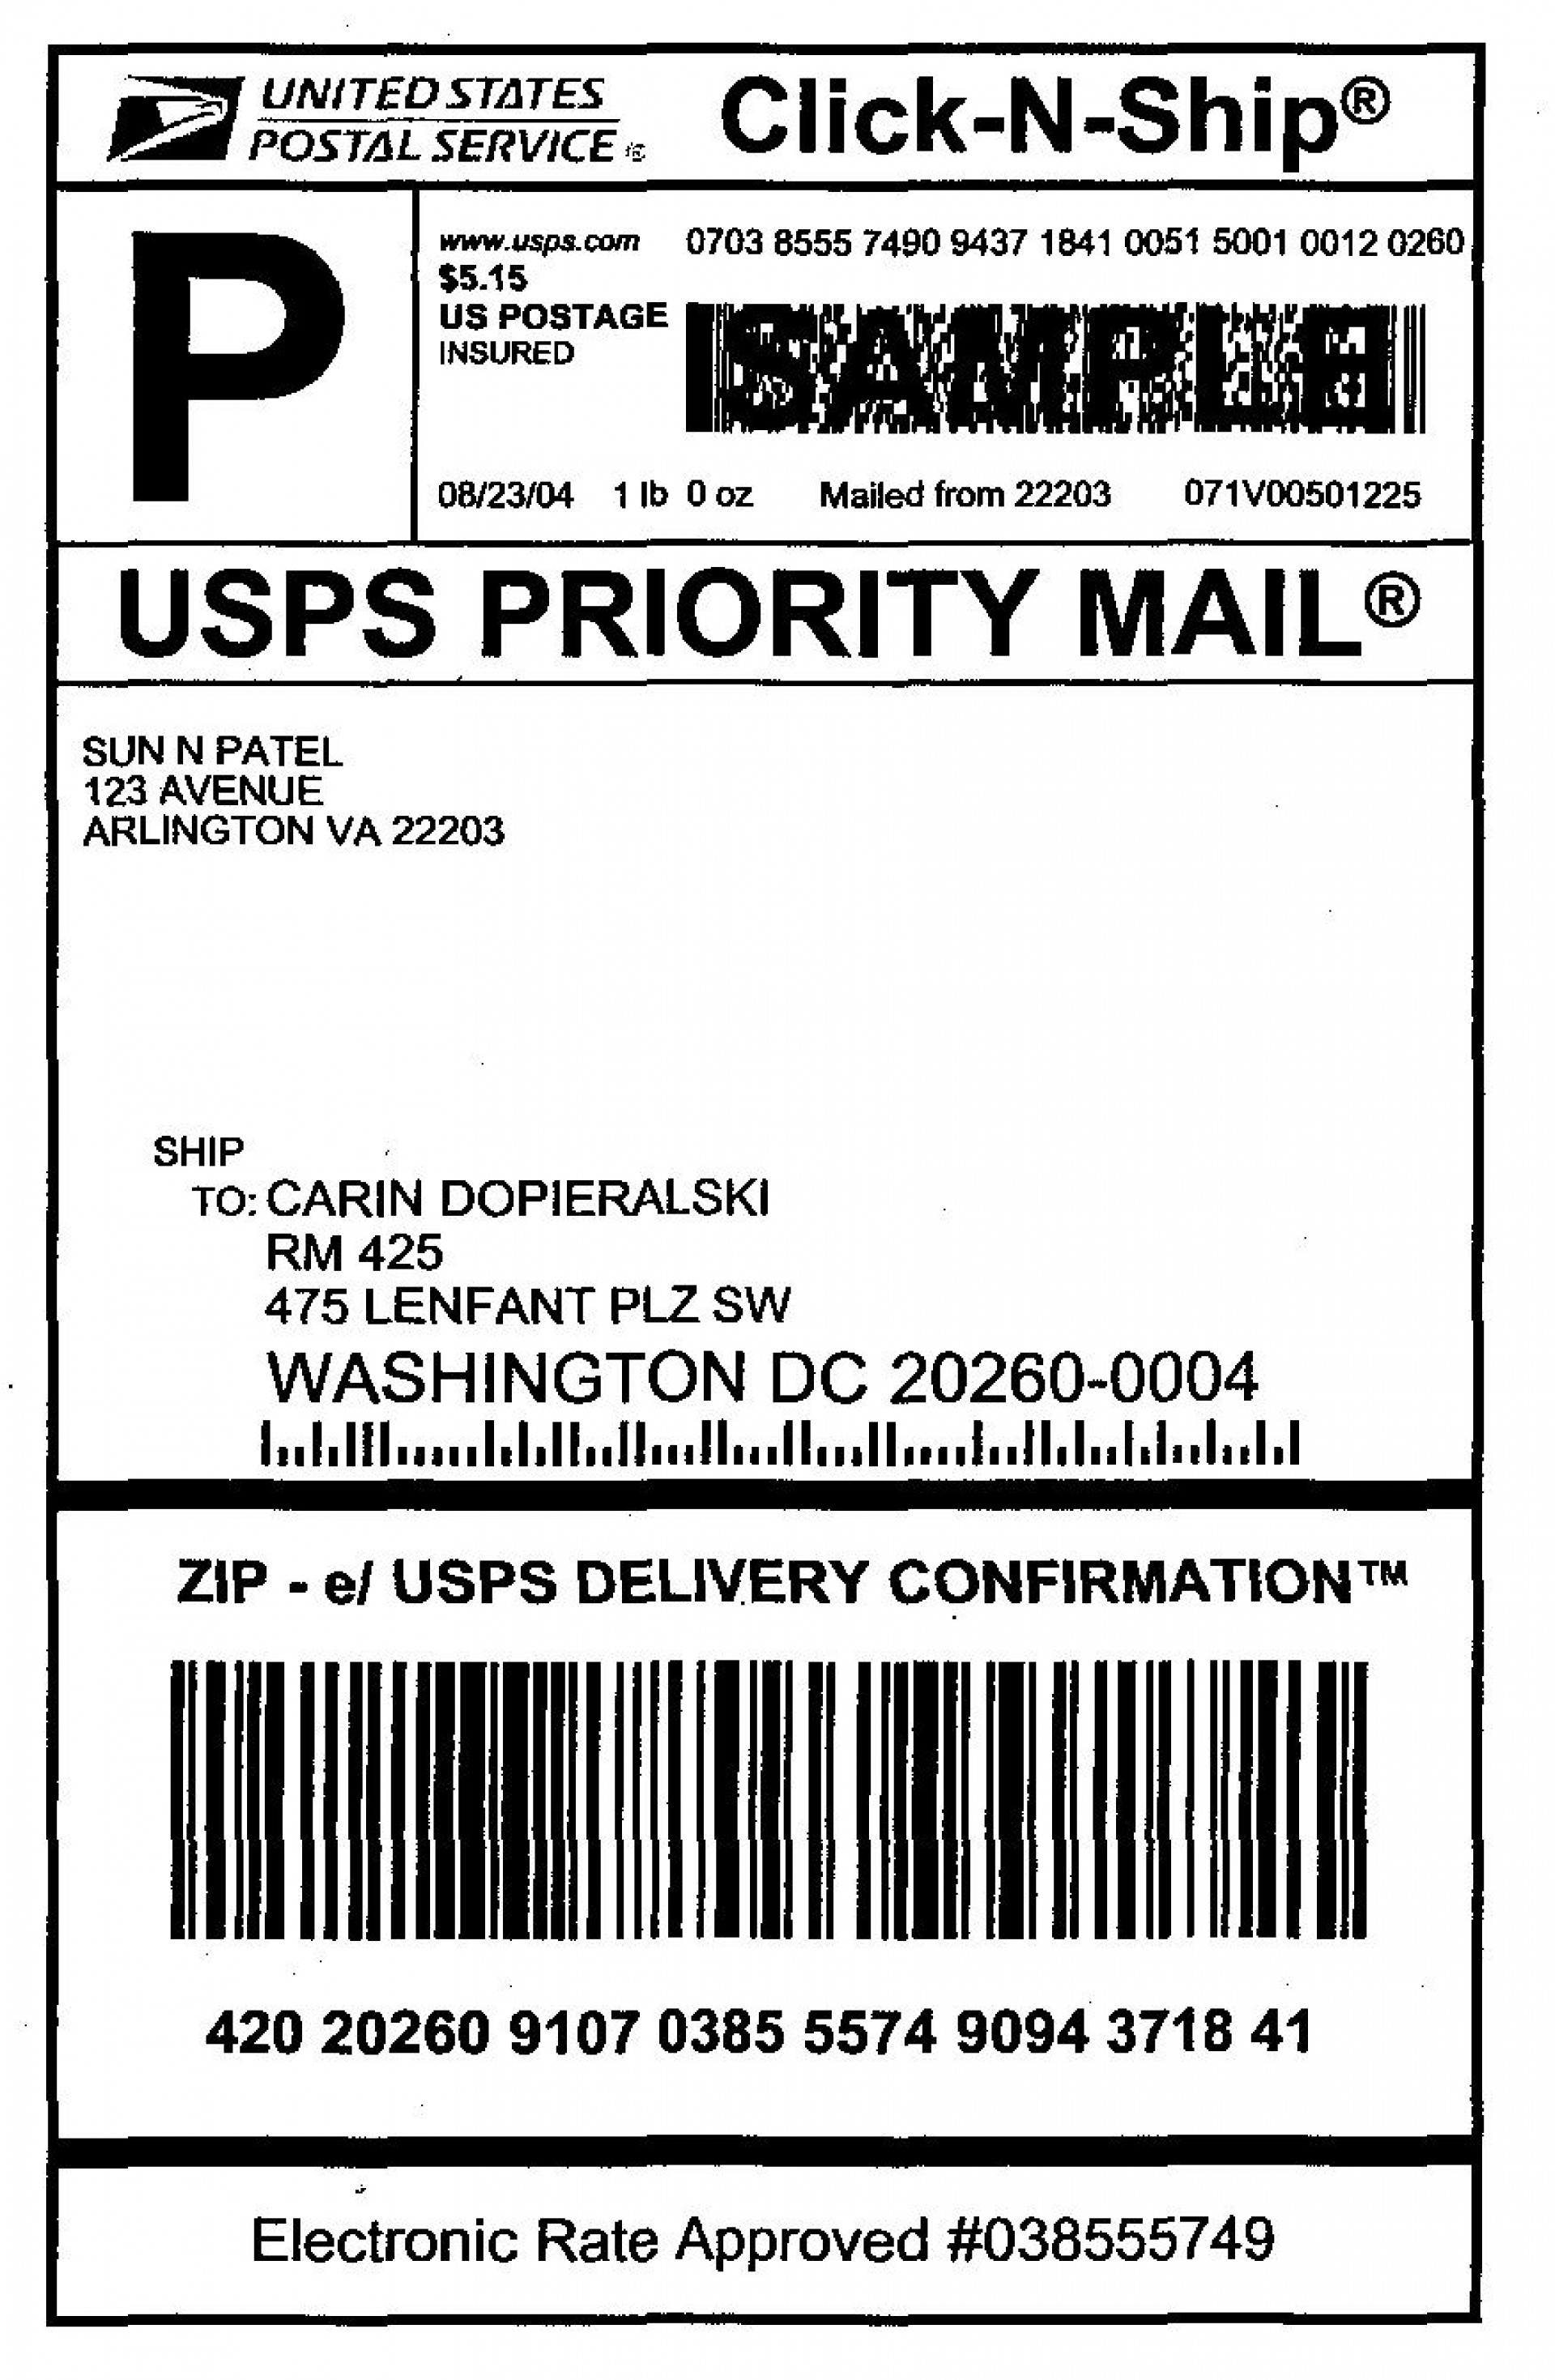 009 Impressive Free Usp Shipping Label Template Sample 1920